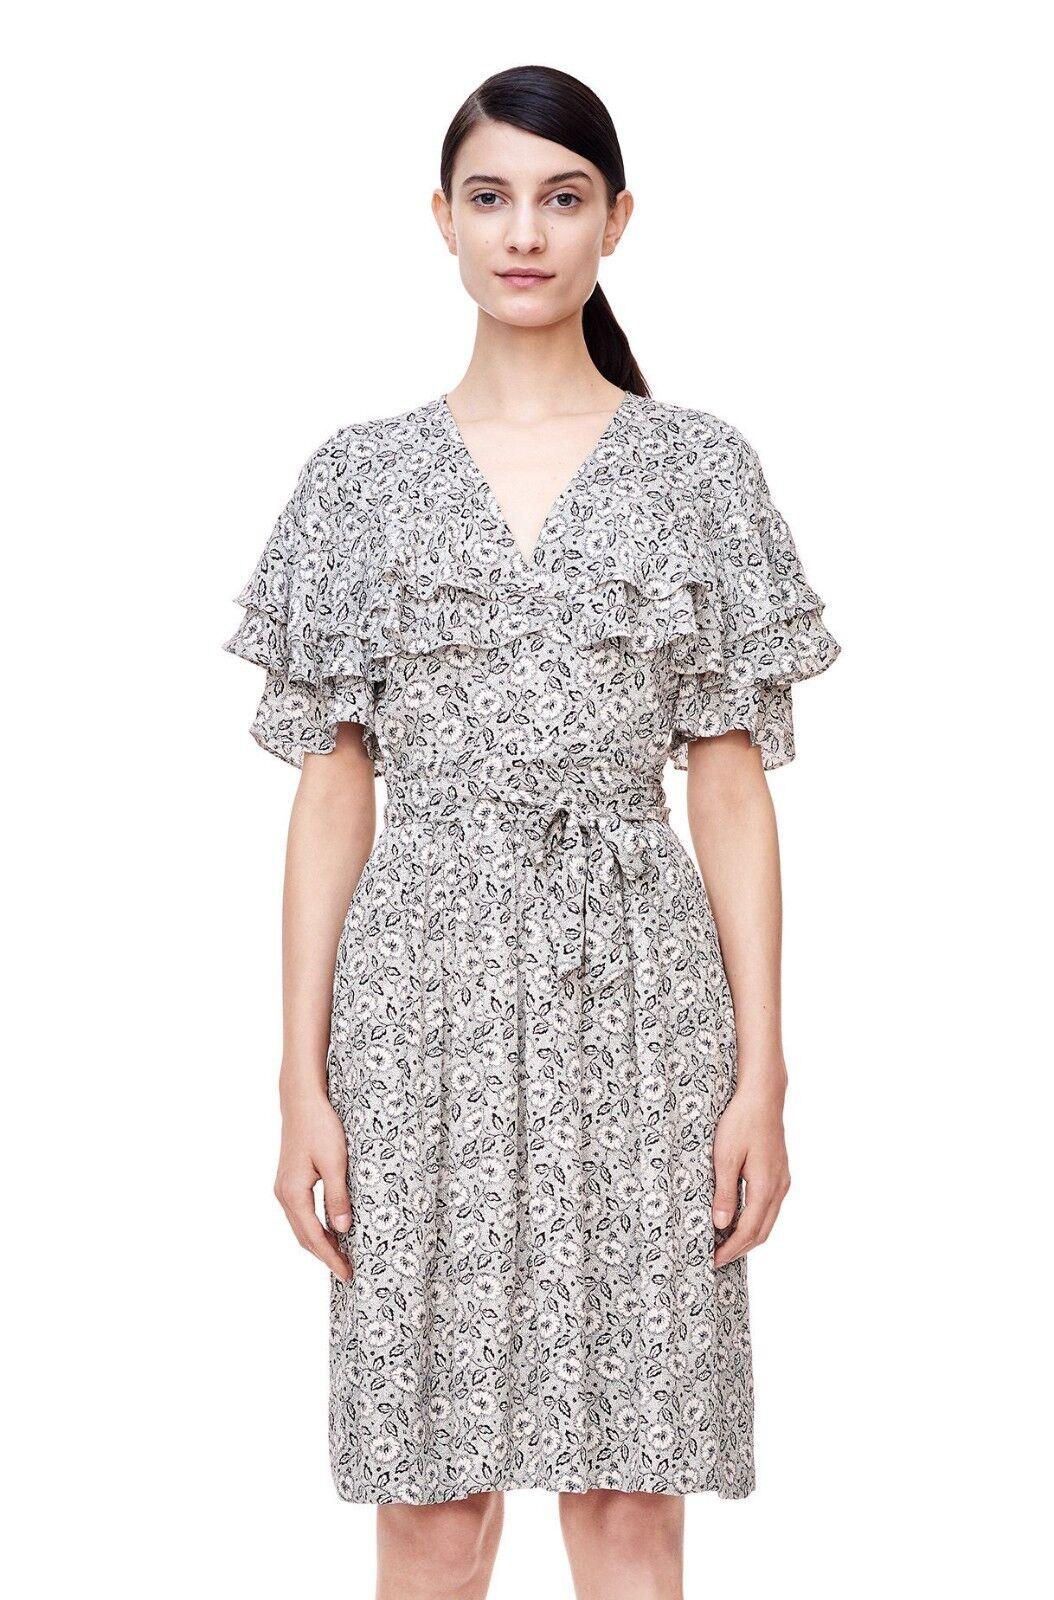 NWT Rebecca Taylor Sweet Briar Ruffle Dress Cream Combo Size 0, 2, 4, 6  495